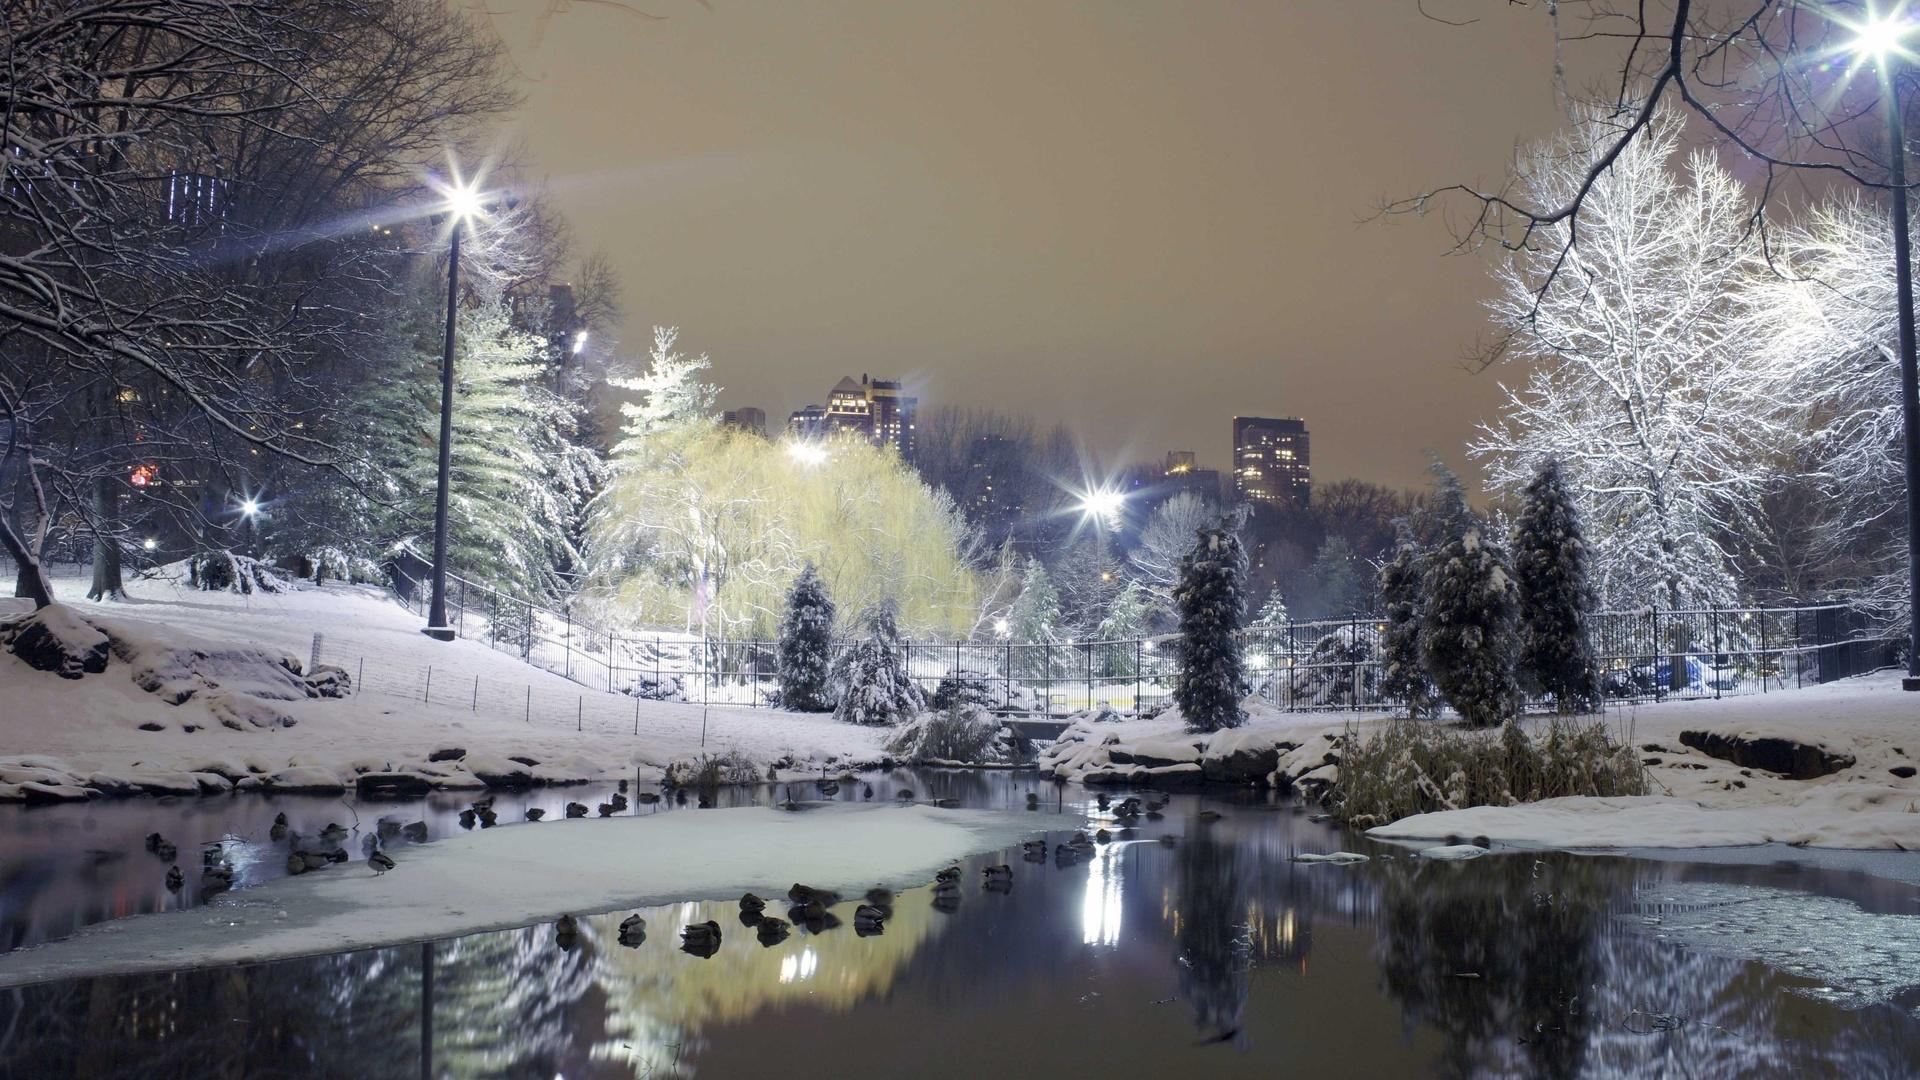 Winter in the City Wallpaper 1920x1080